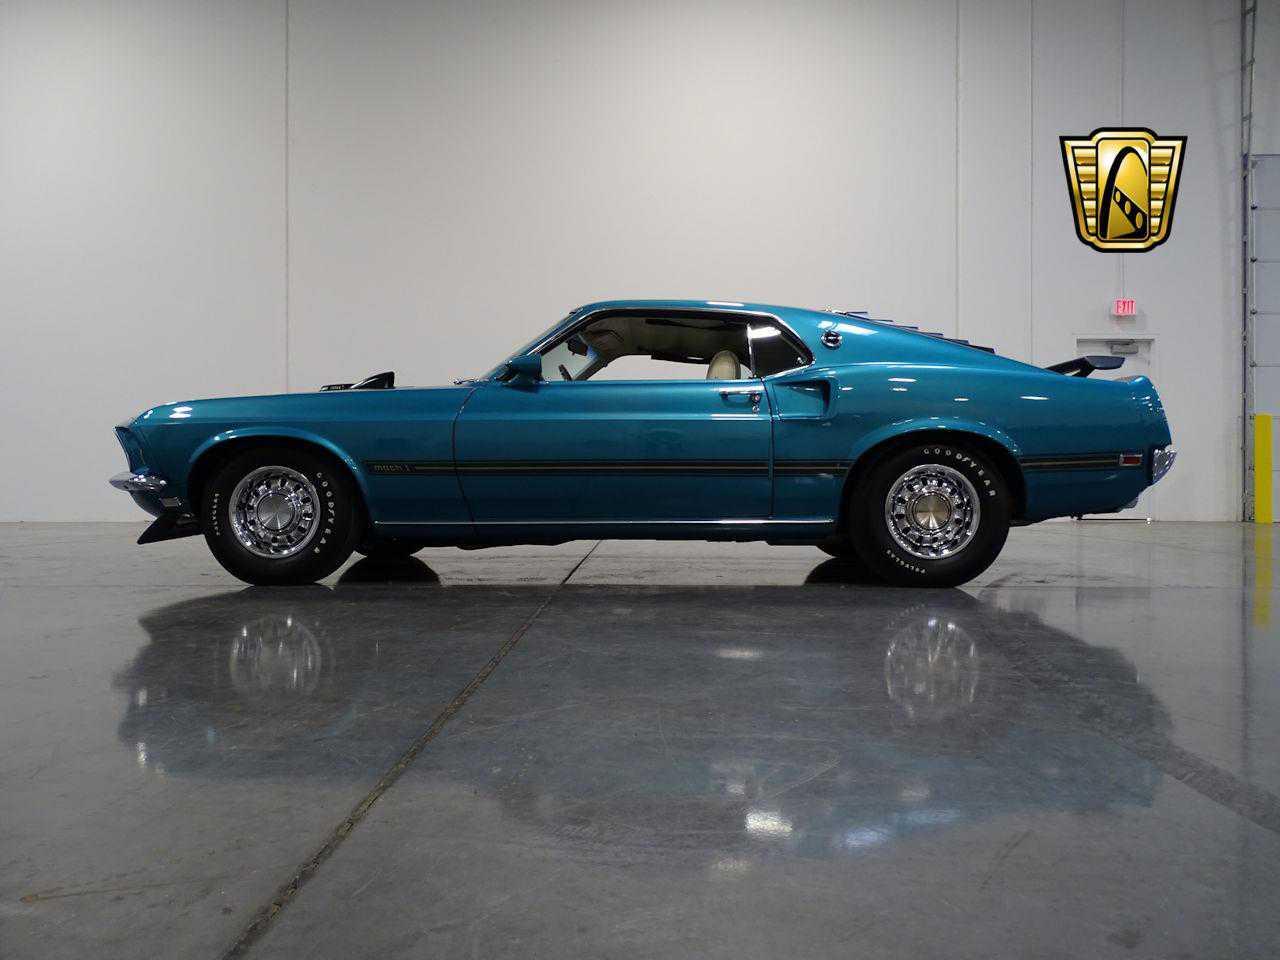 1969 Ford Mustang For Sale In Deer Valley Az Gccsct131 Mach 1 Gulfstream Aqua Prev Next